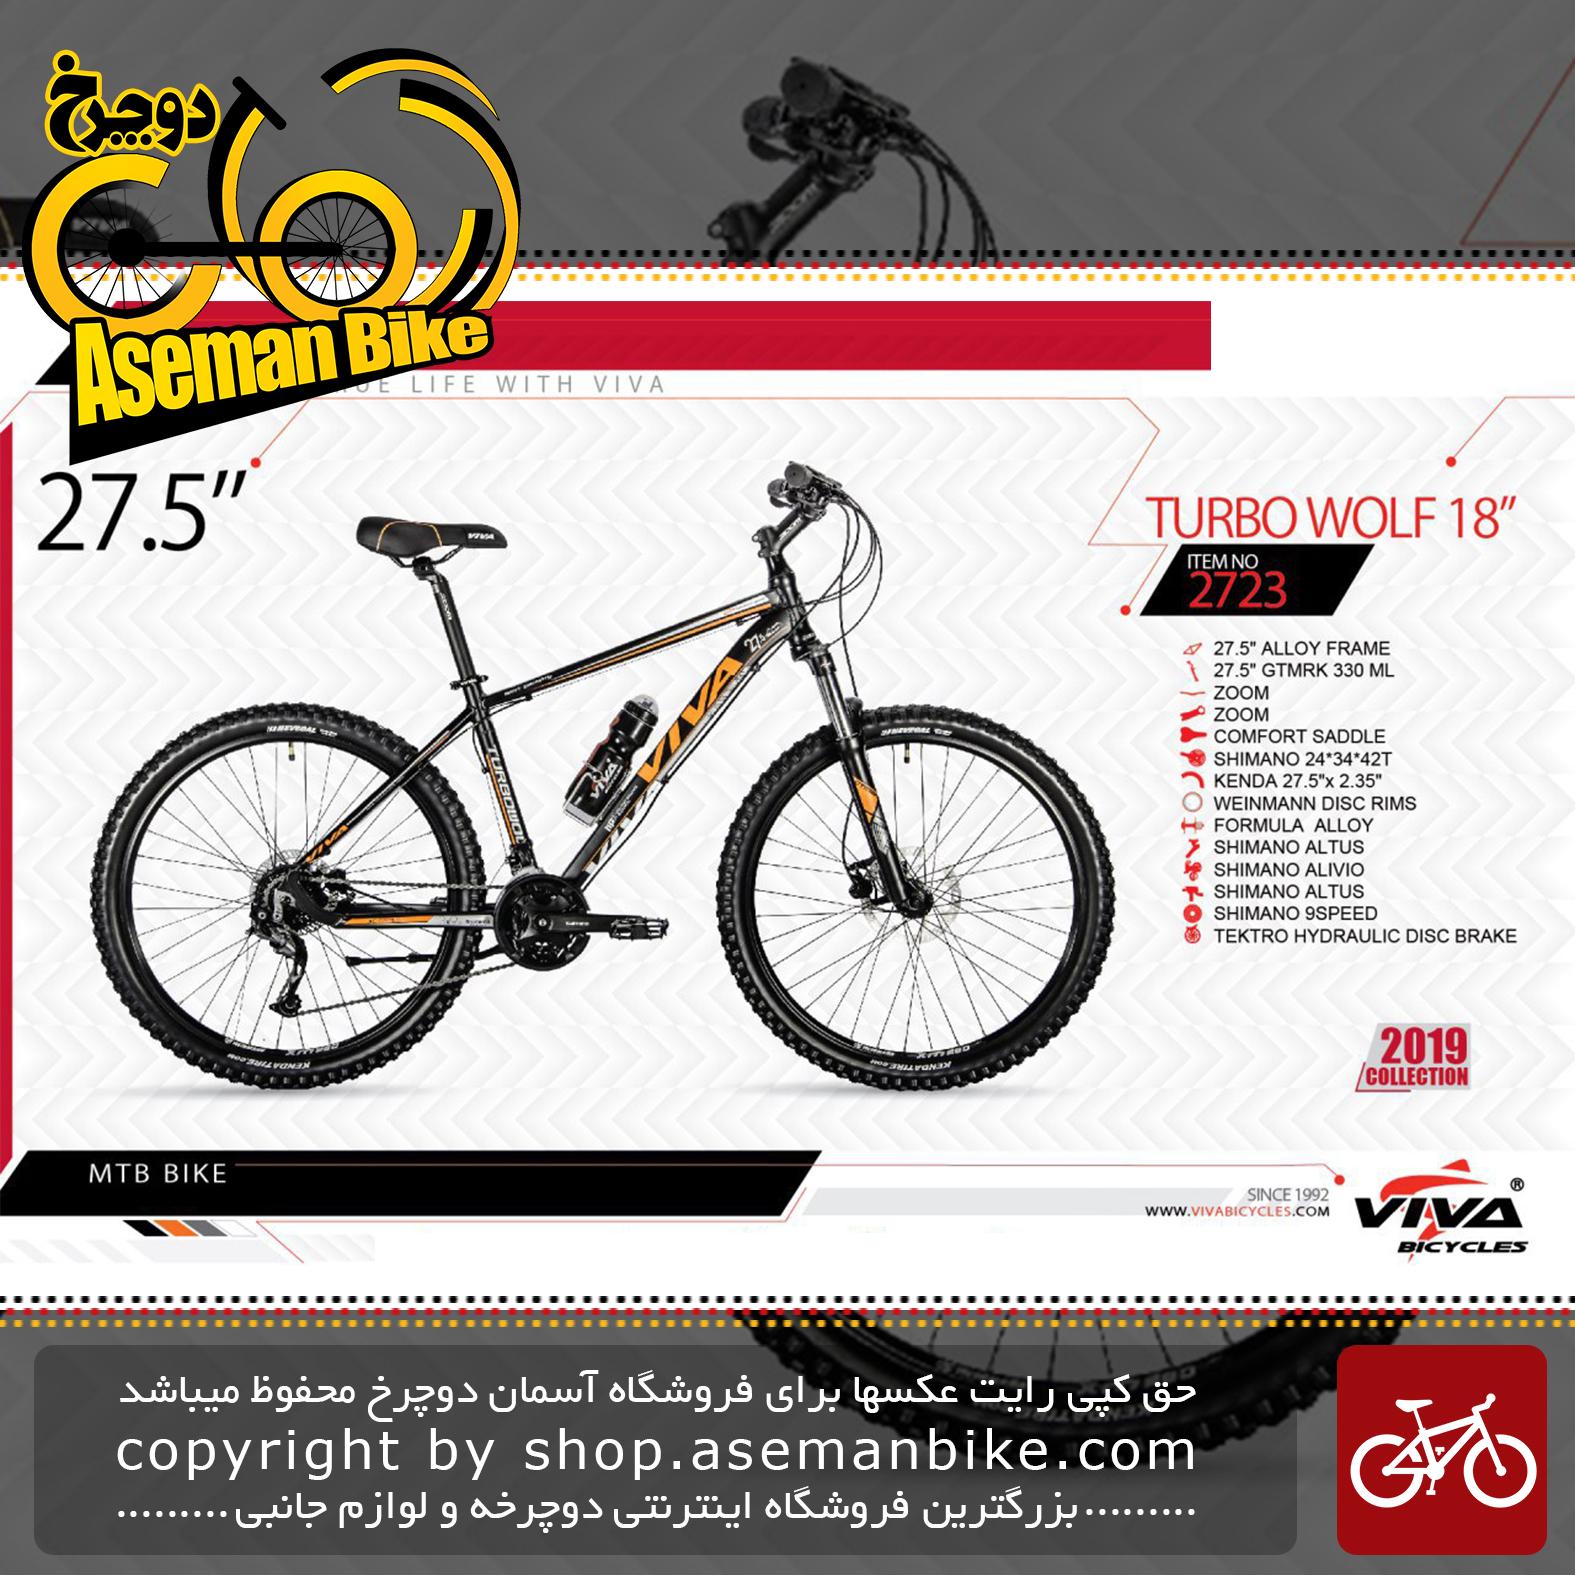 دوچرخه کوهستان سایز 27.5 ویوا مدل توربو ولف18 VIVA TORBOWOLF 18 SIZE 27.5 20192019